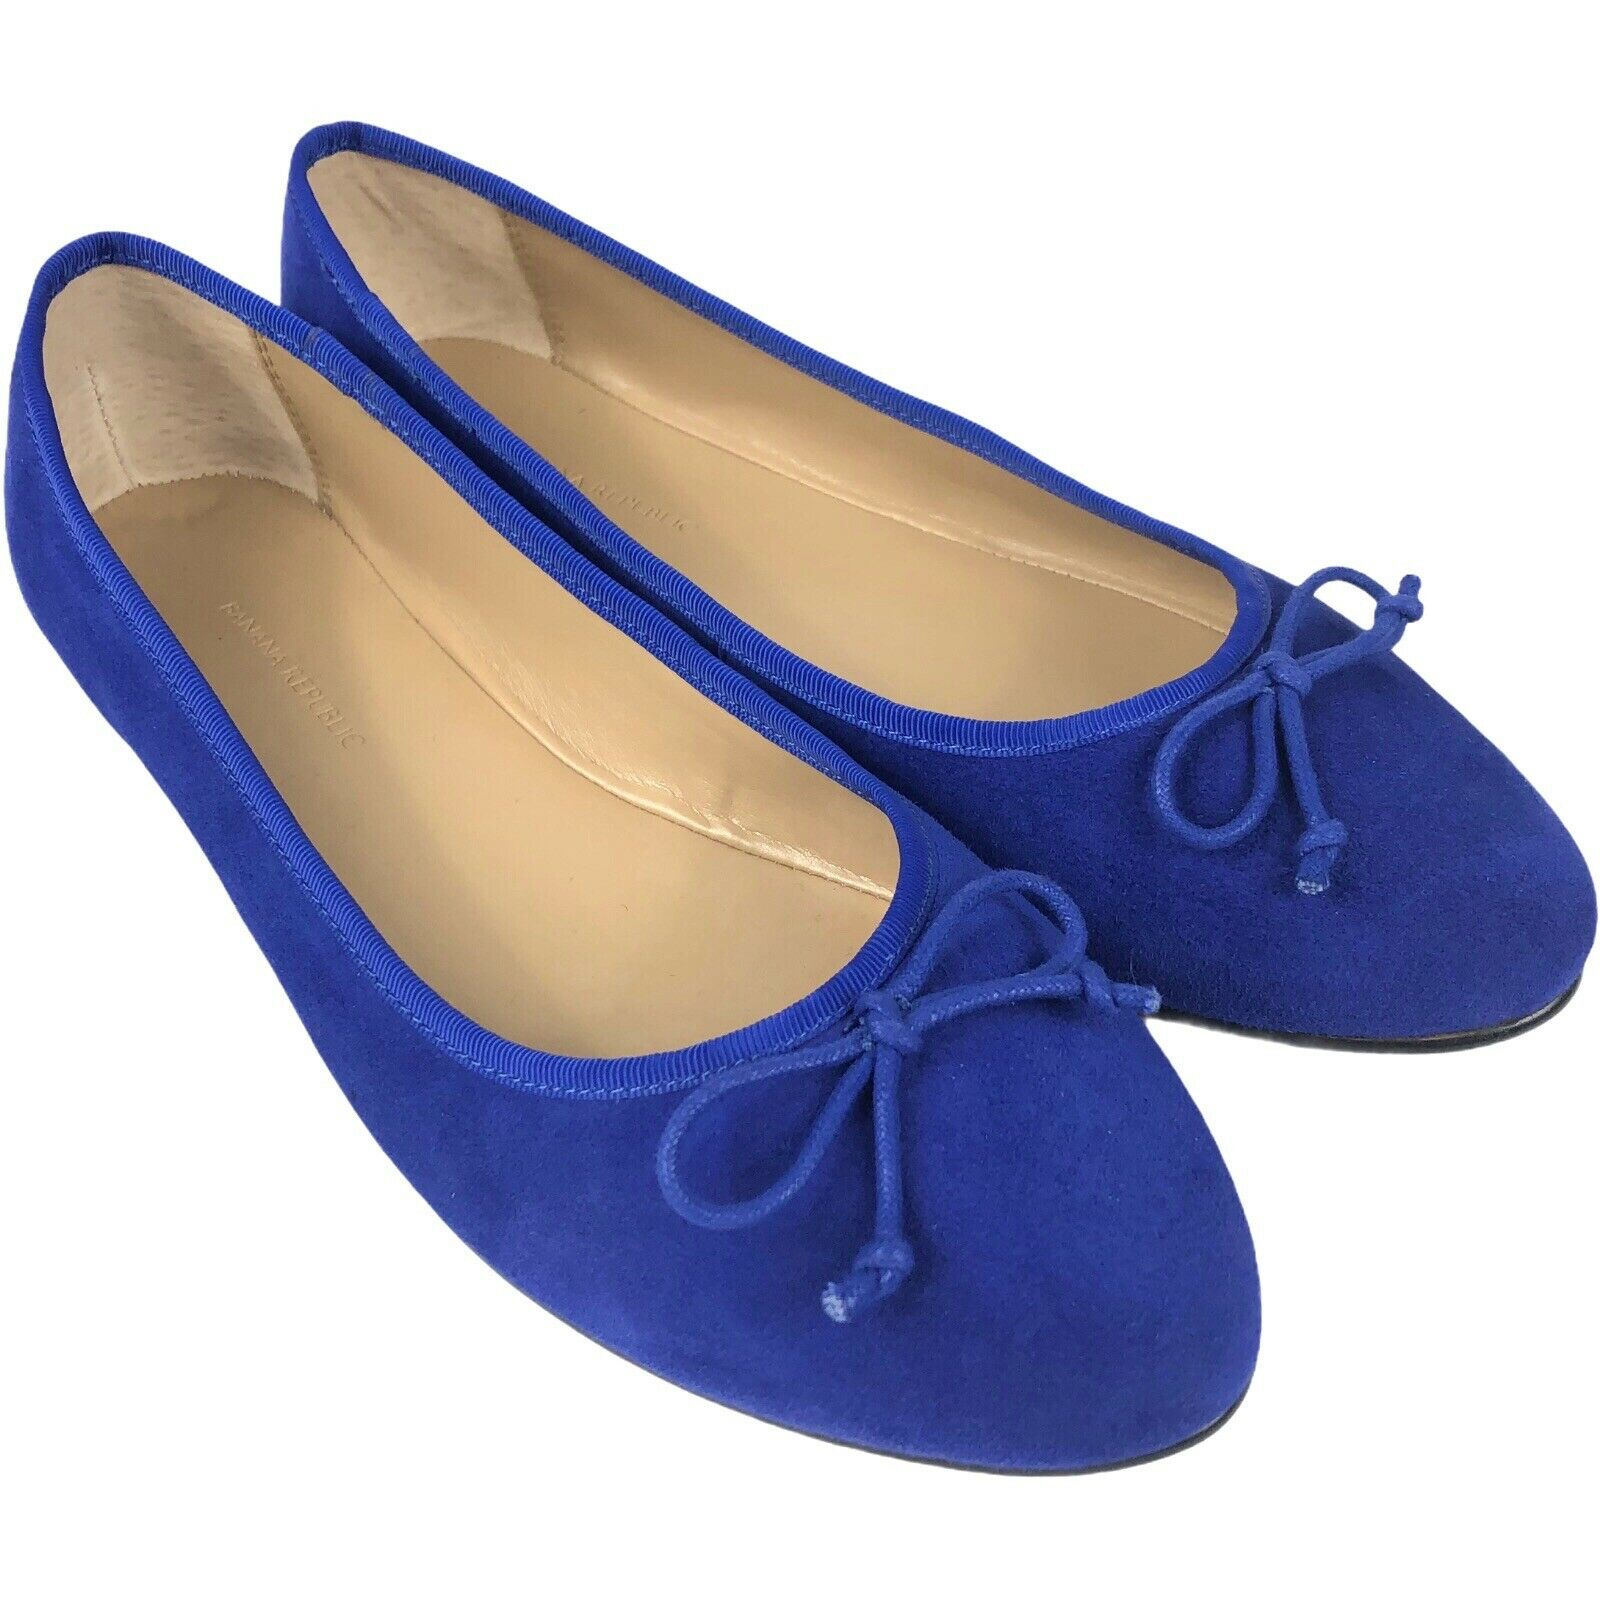 Banana Republic Femme Ballerines Taille 8.5 Ballet Style Daim Bleu